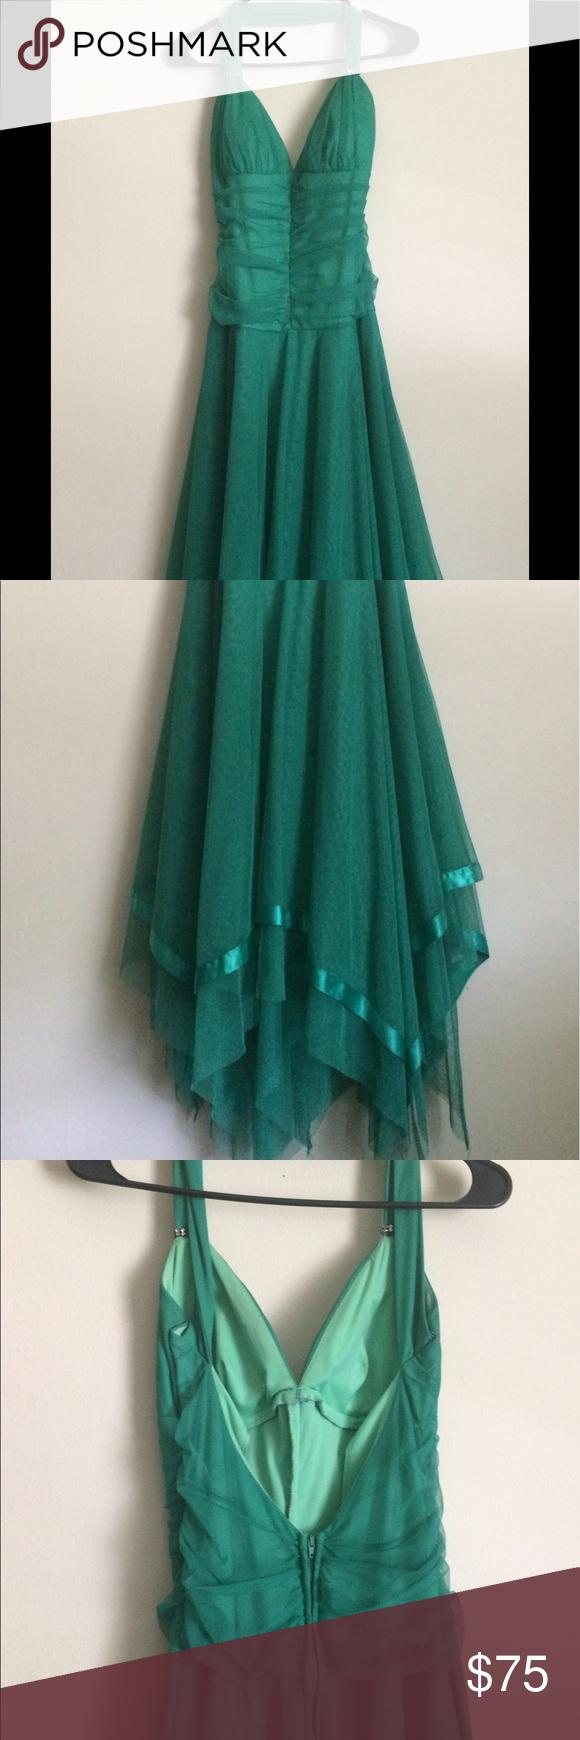 Emerald green prom dress  Emerald Green Formal Gown  Formal gowns Formal prom dresses and